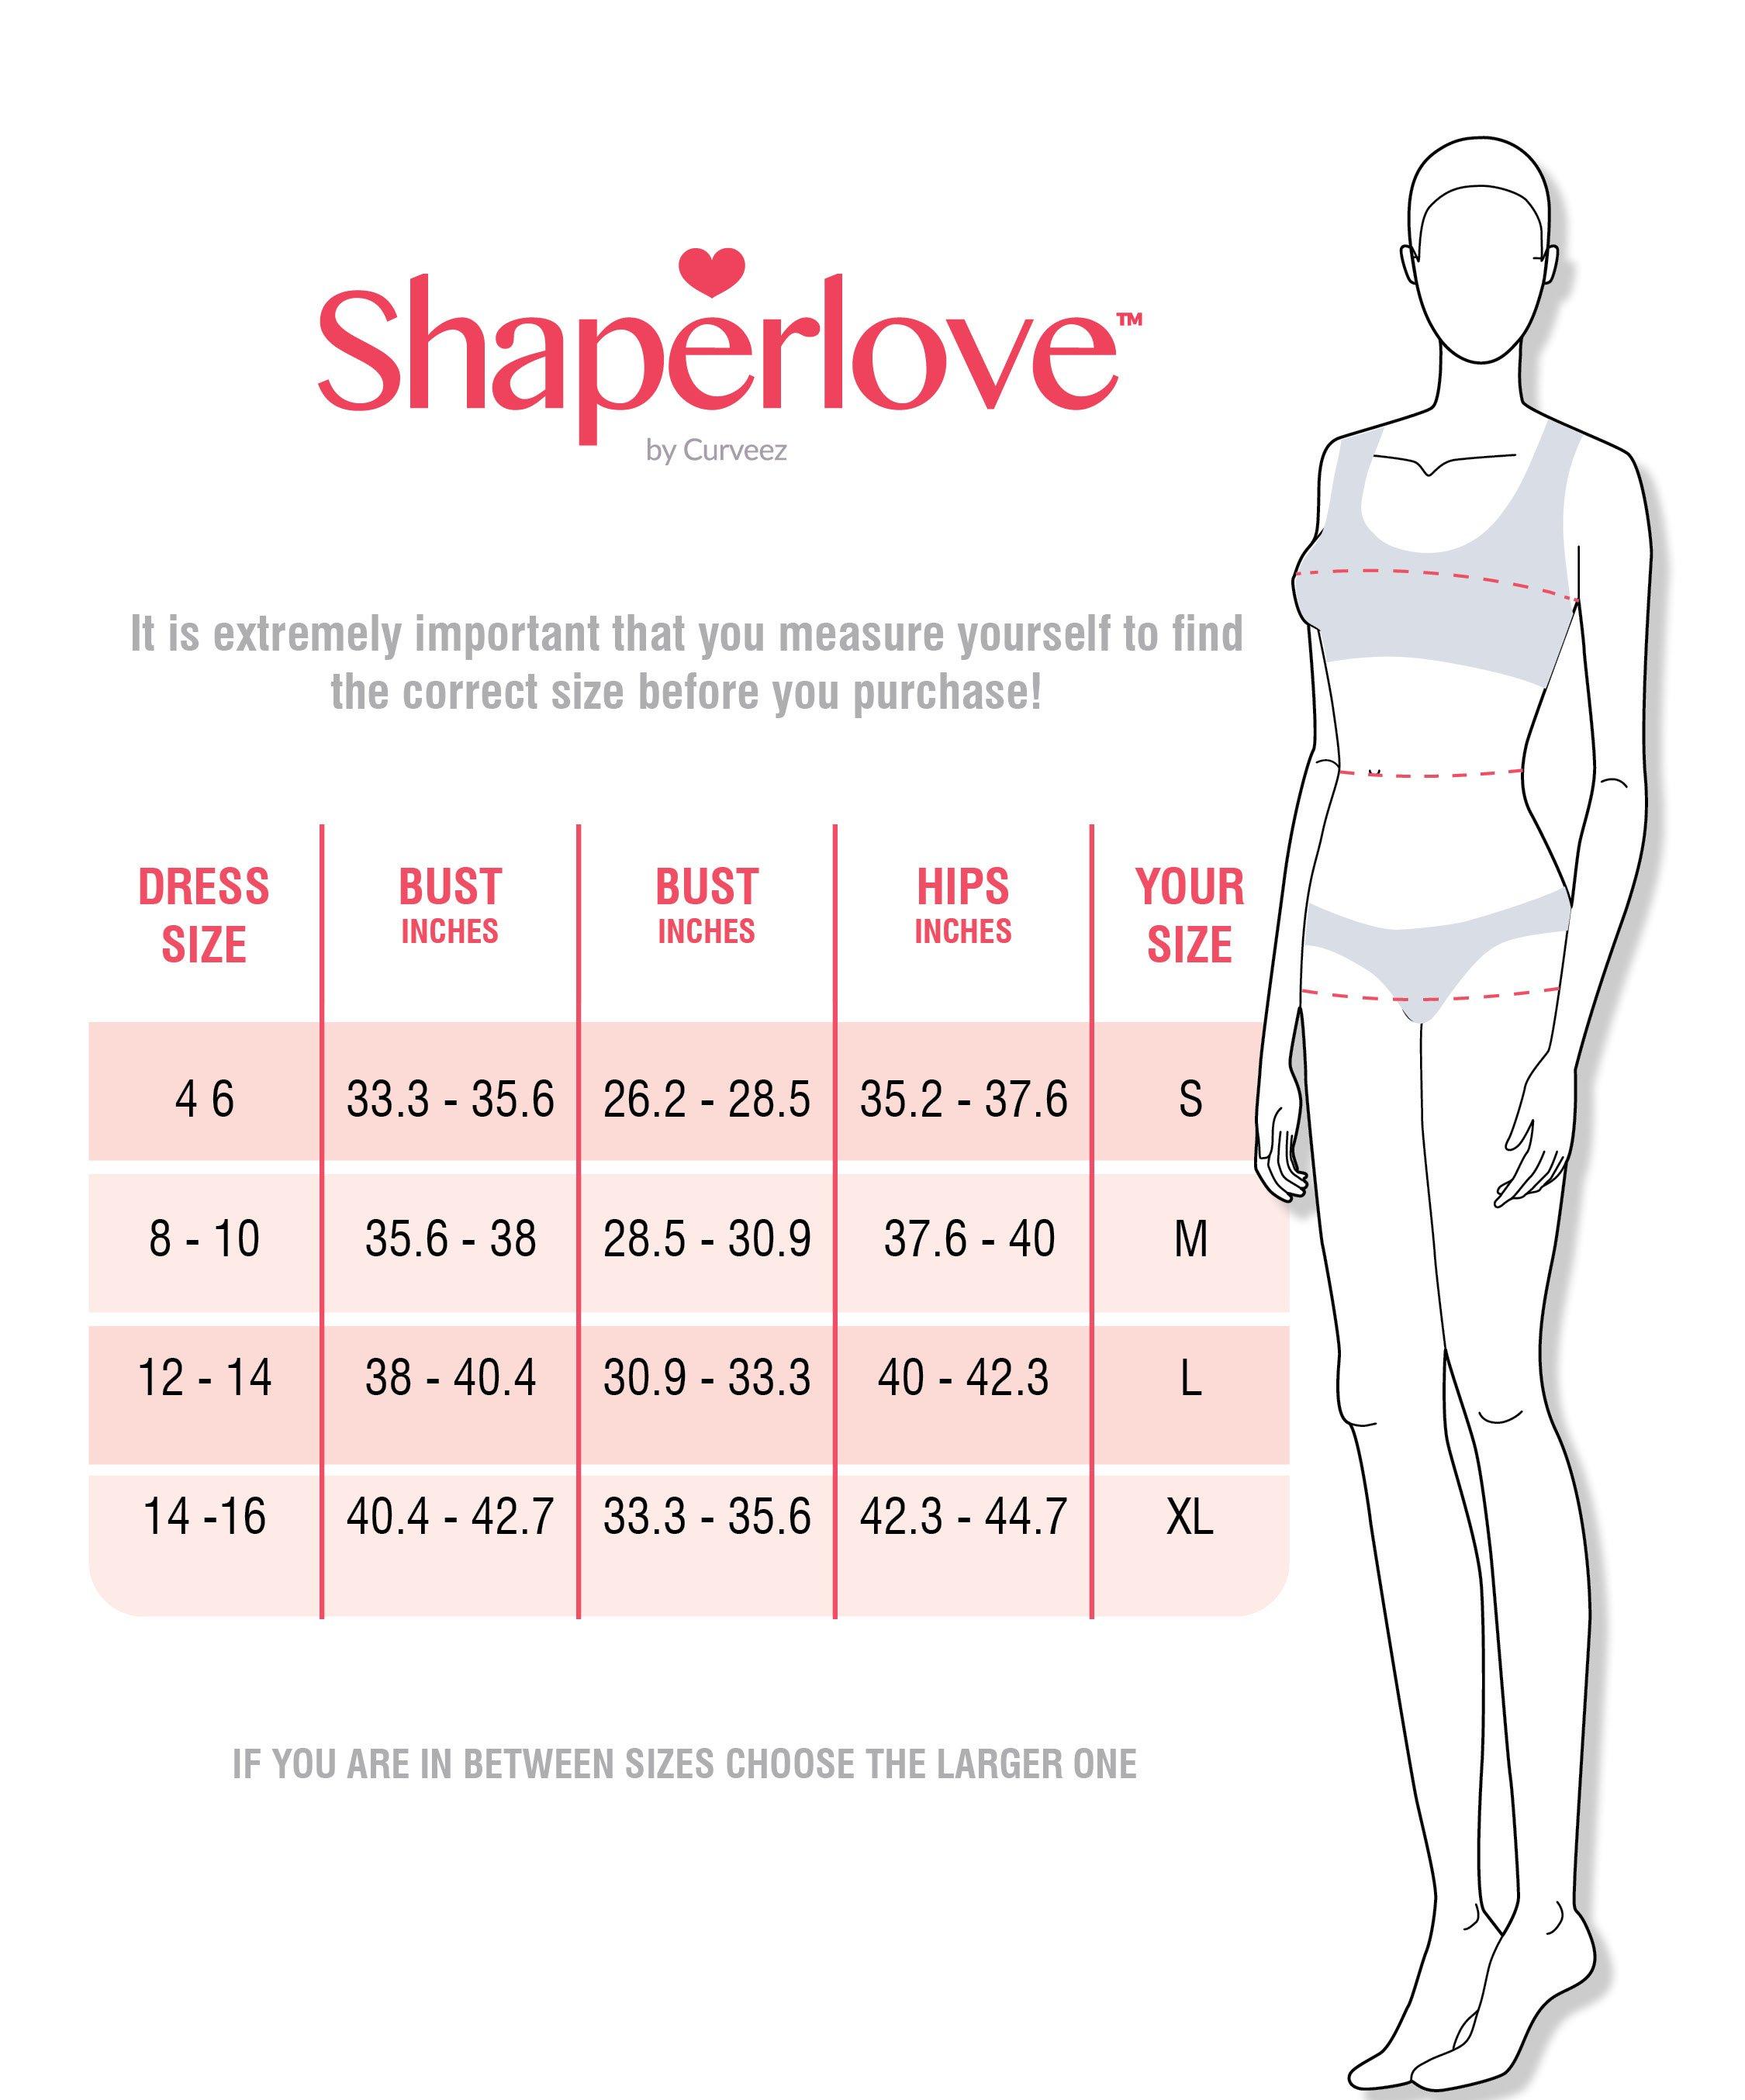 shaperlove-size-chart.jpg